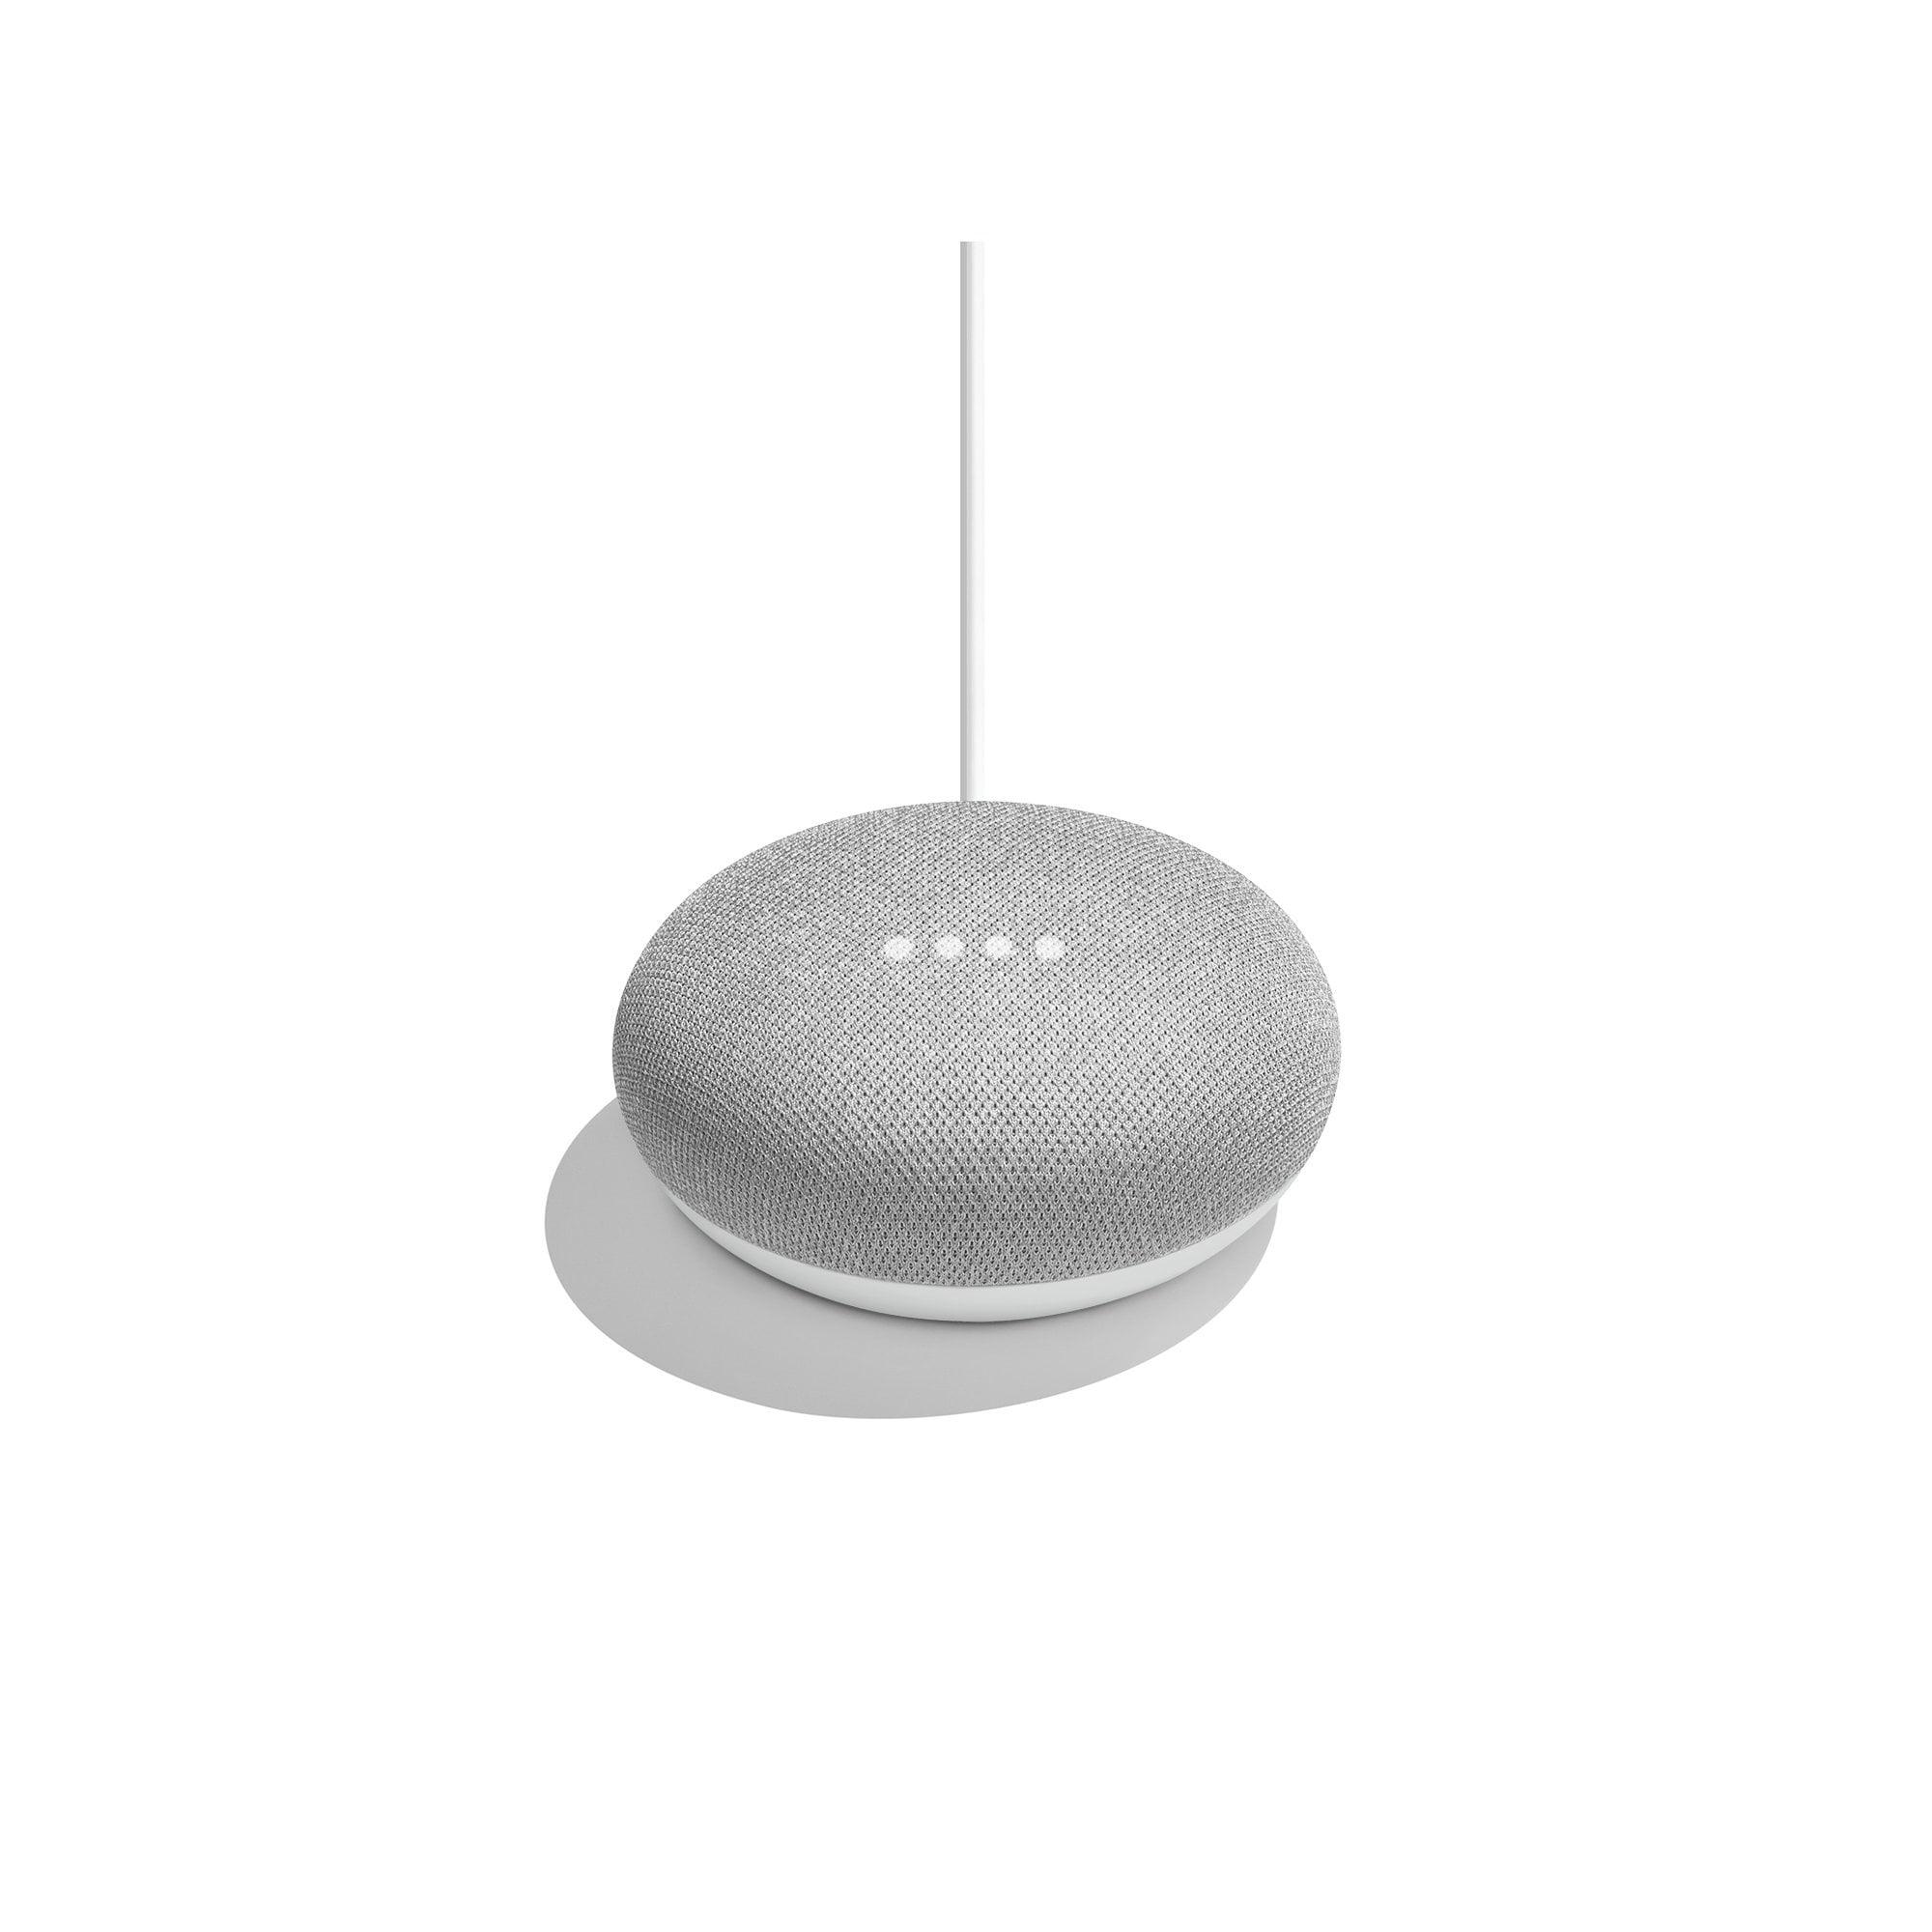 951f0af4caa4 Google Home Mini- Chalk - Walmart.com